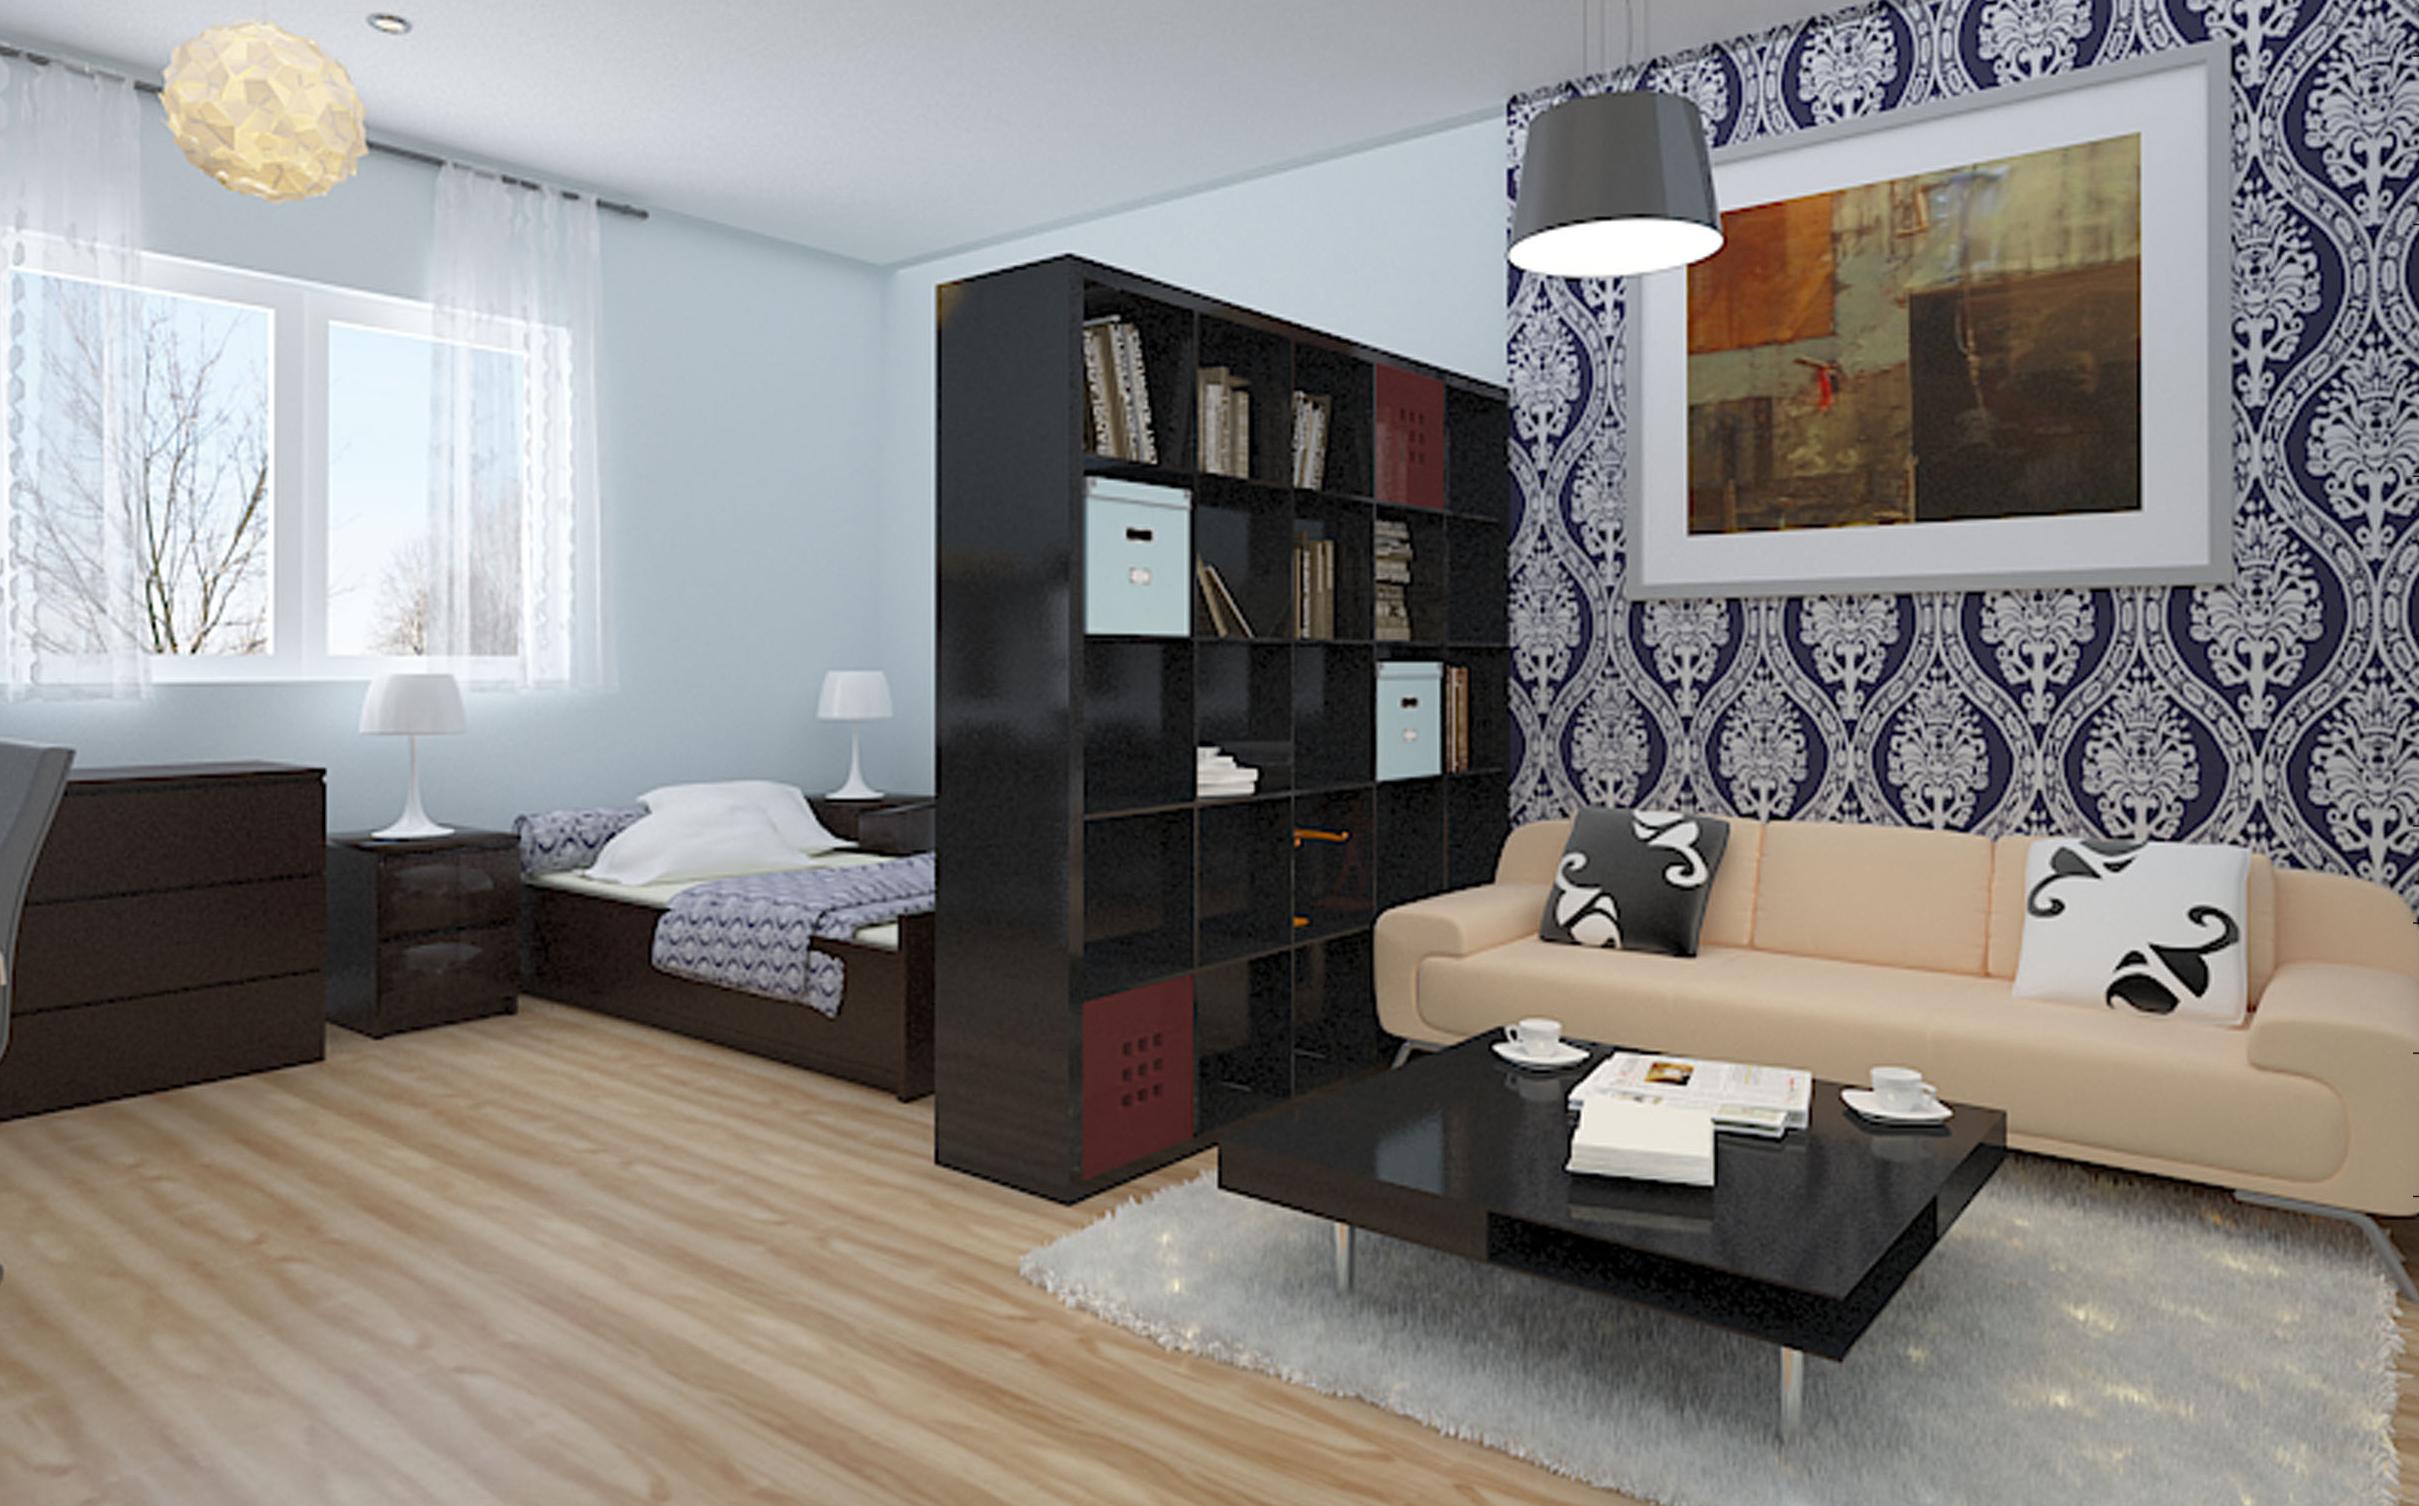 arcbazarcom  ViewDesignerProject ProjectApartment Design Designed by Qarch Team  IKEA